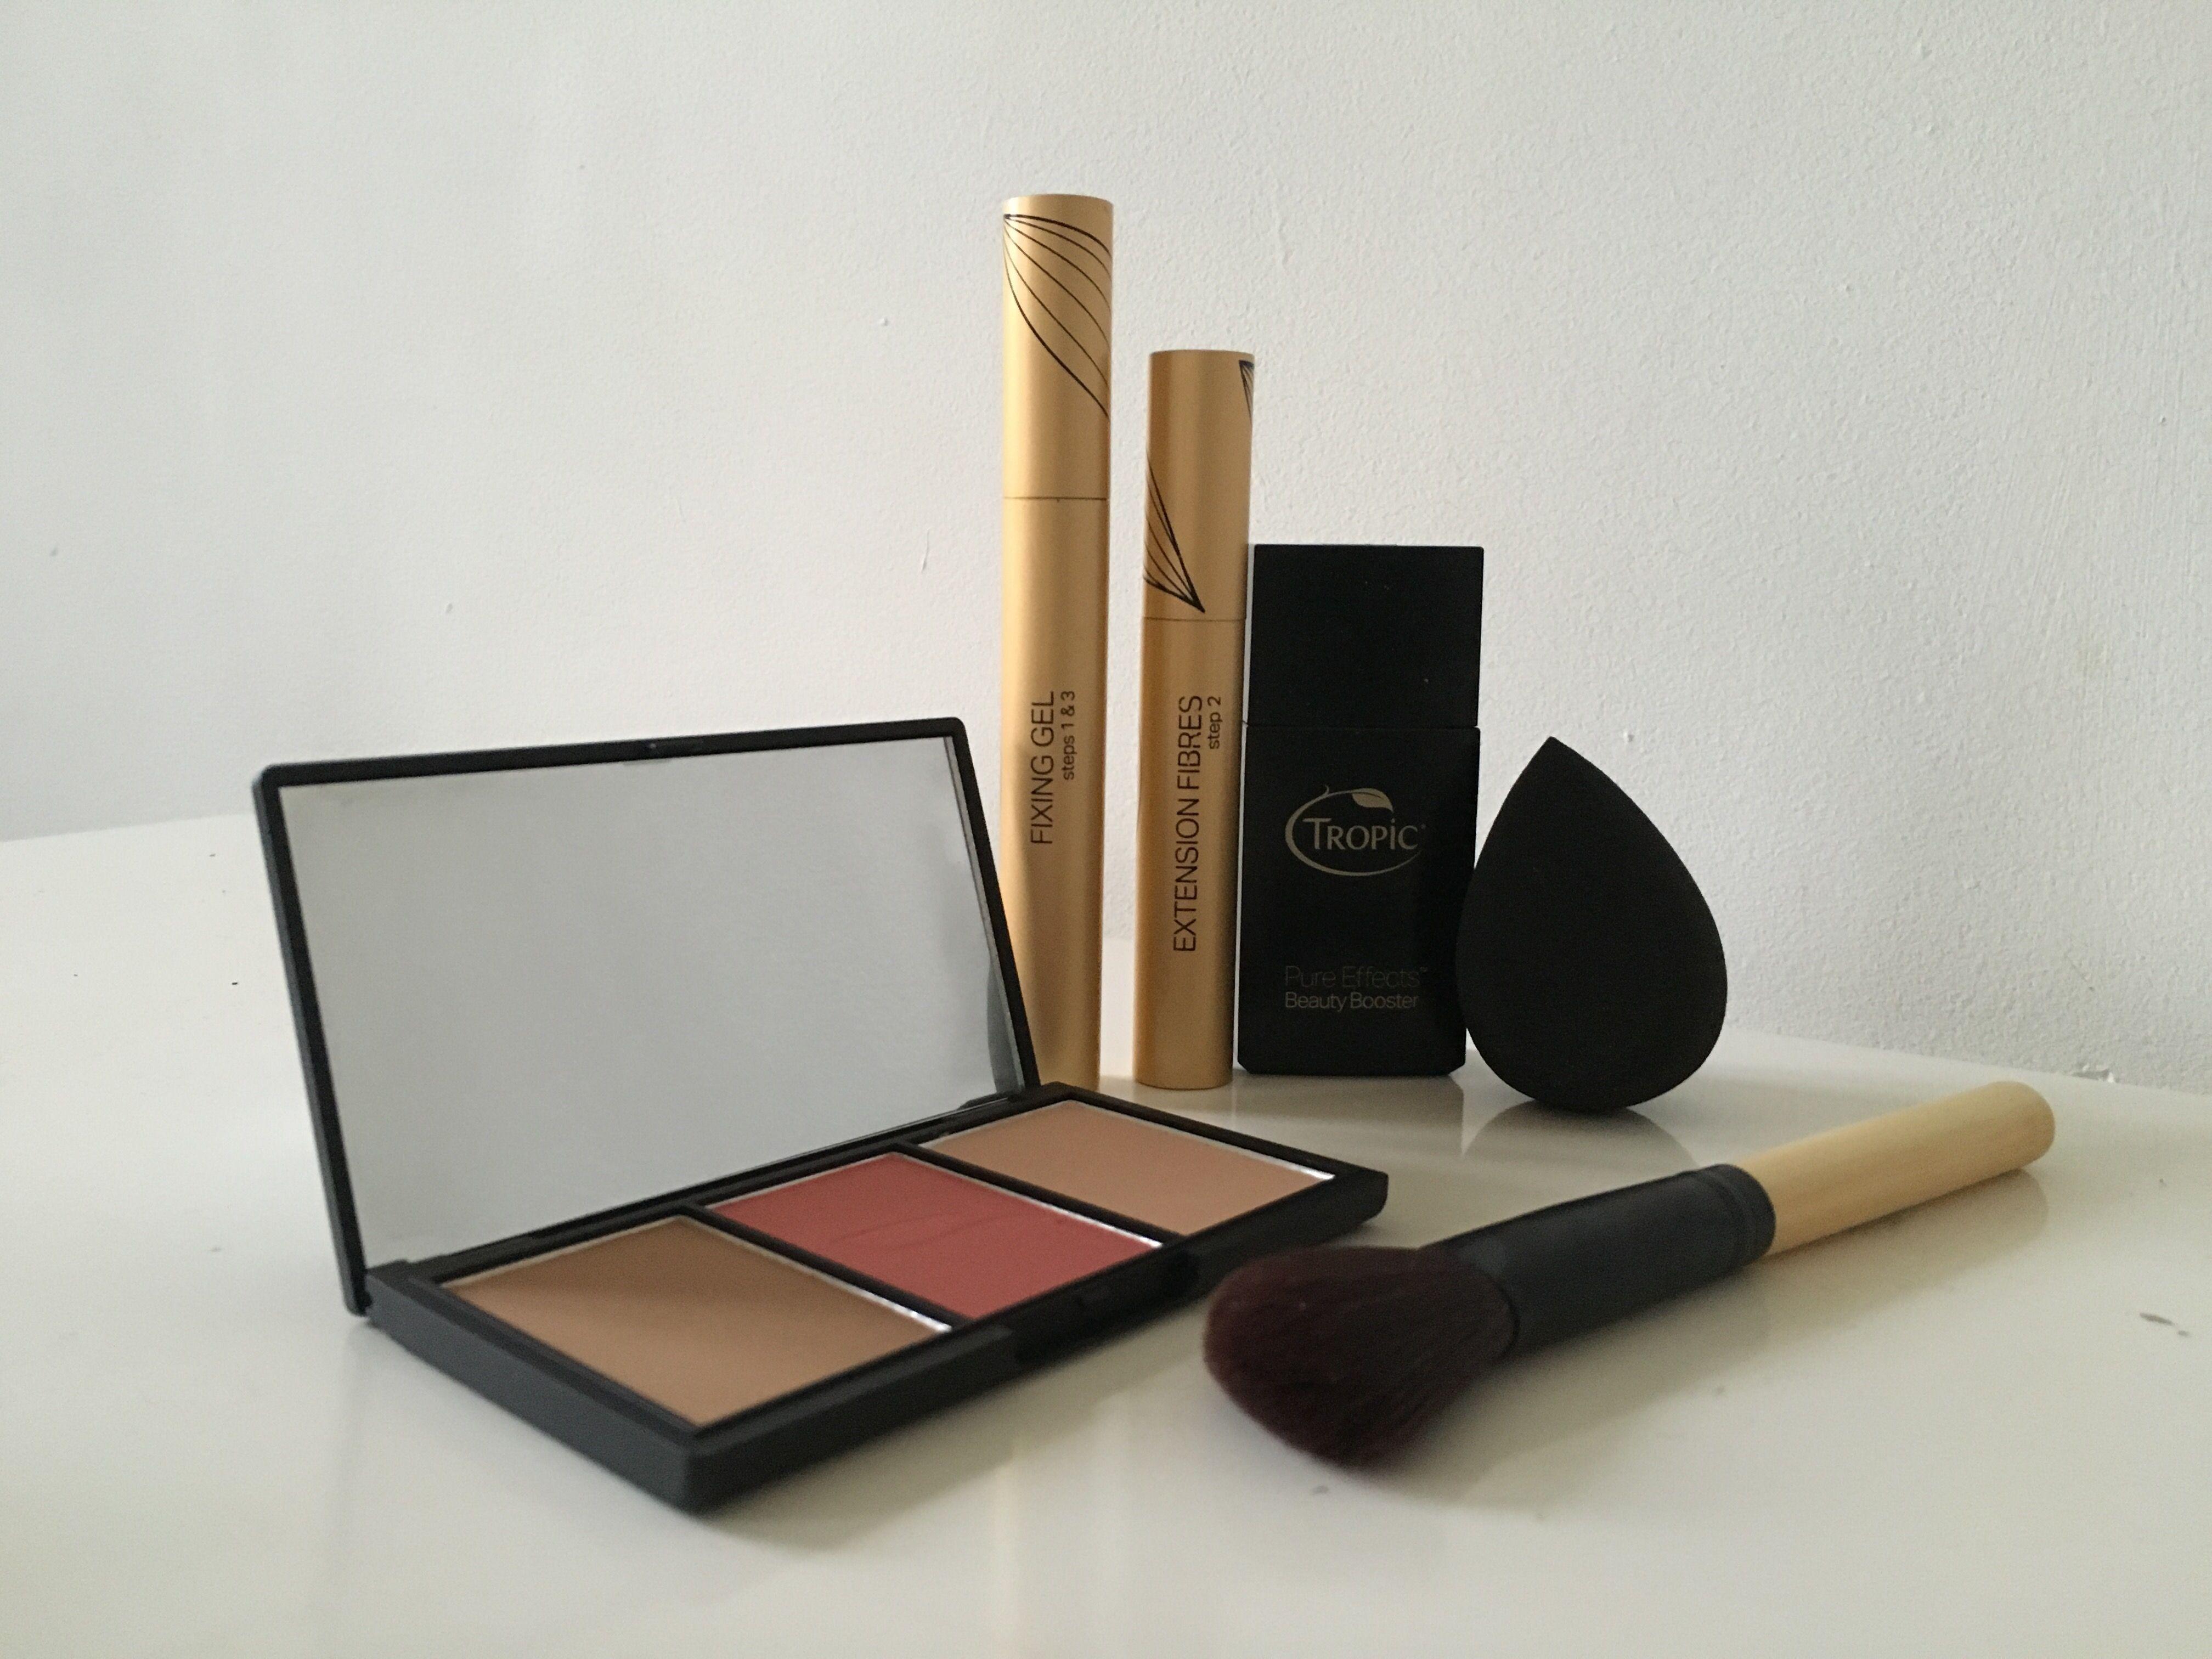 Vegan and cruelty free makeup review Tropic Skincare